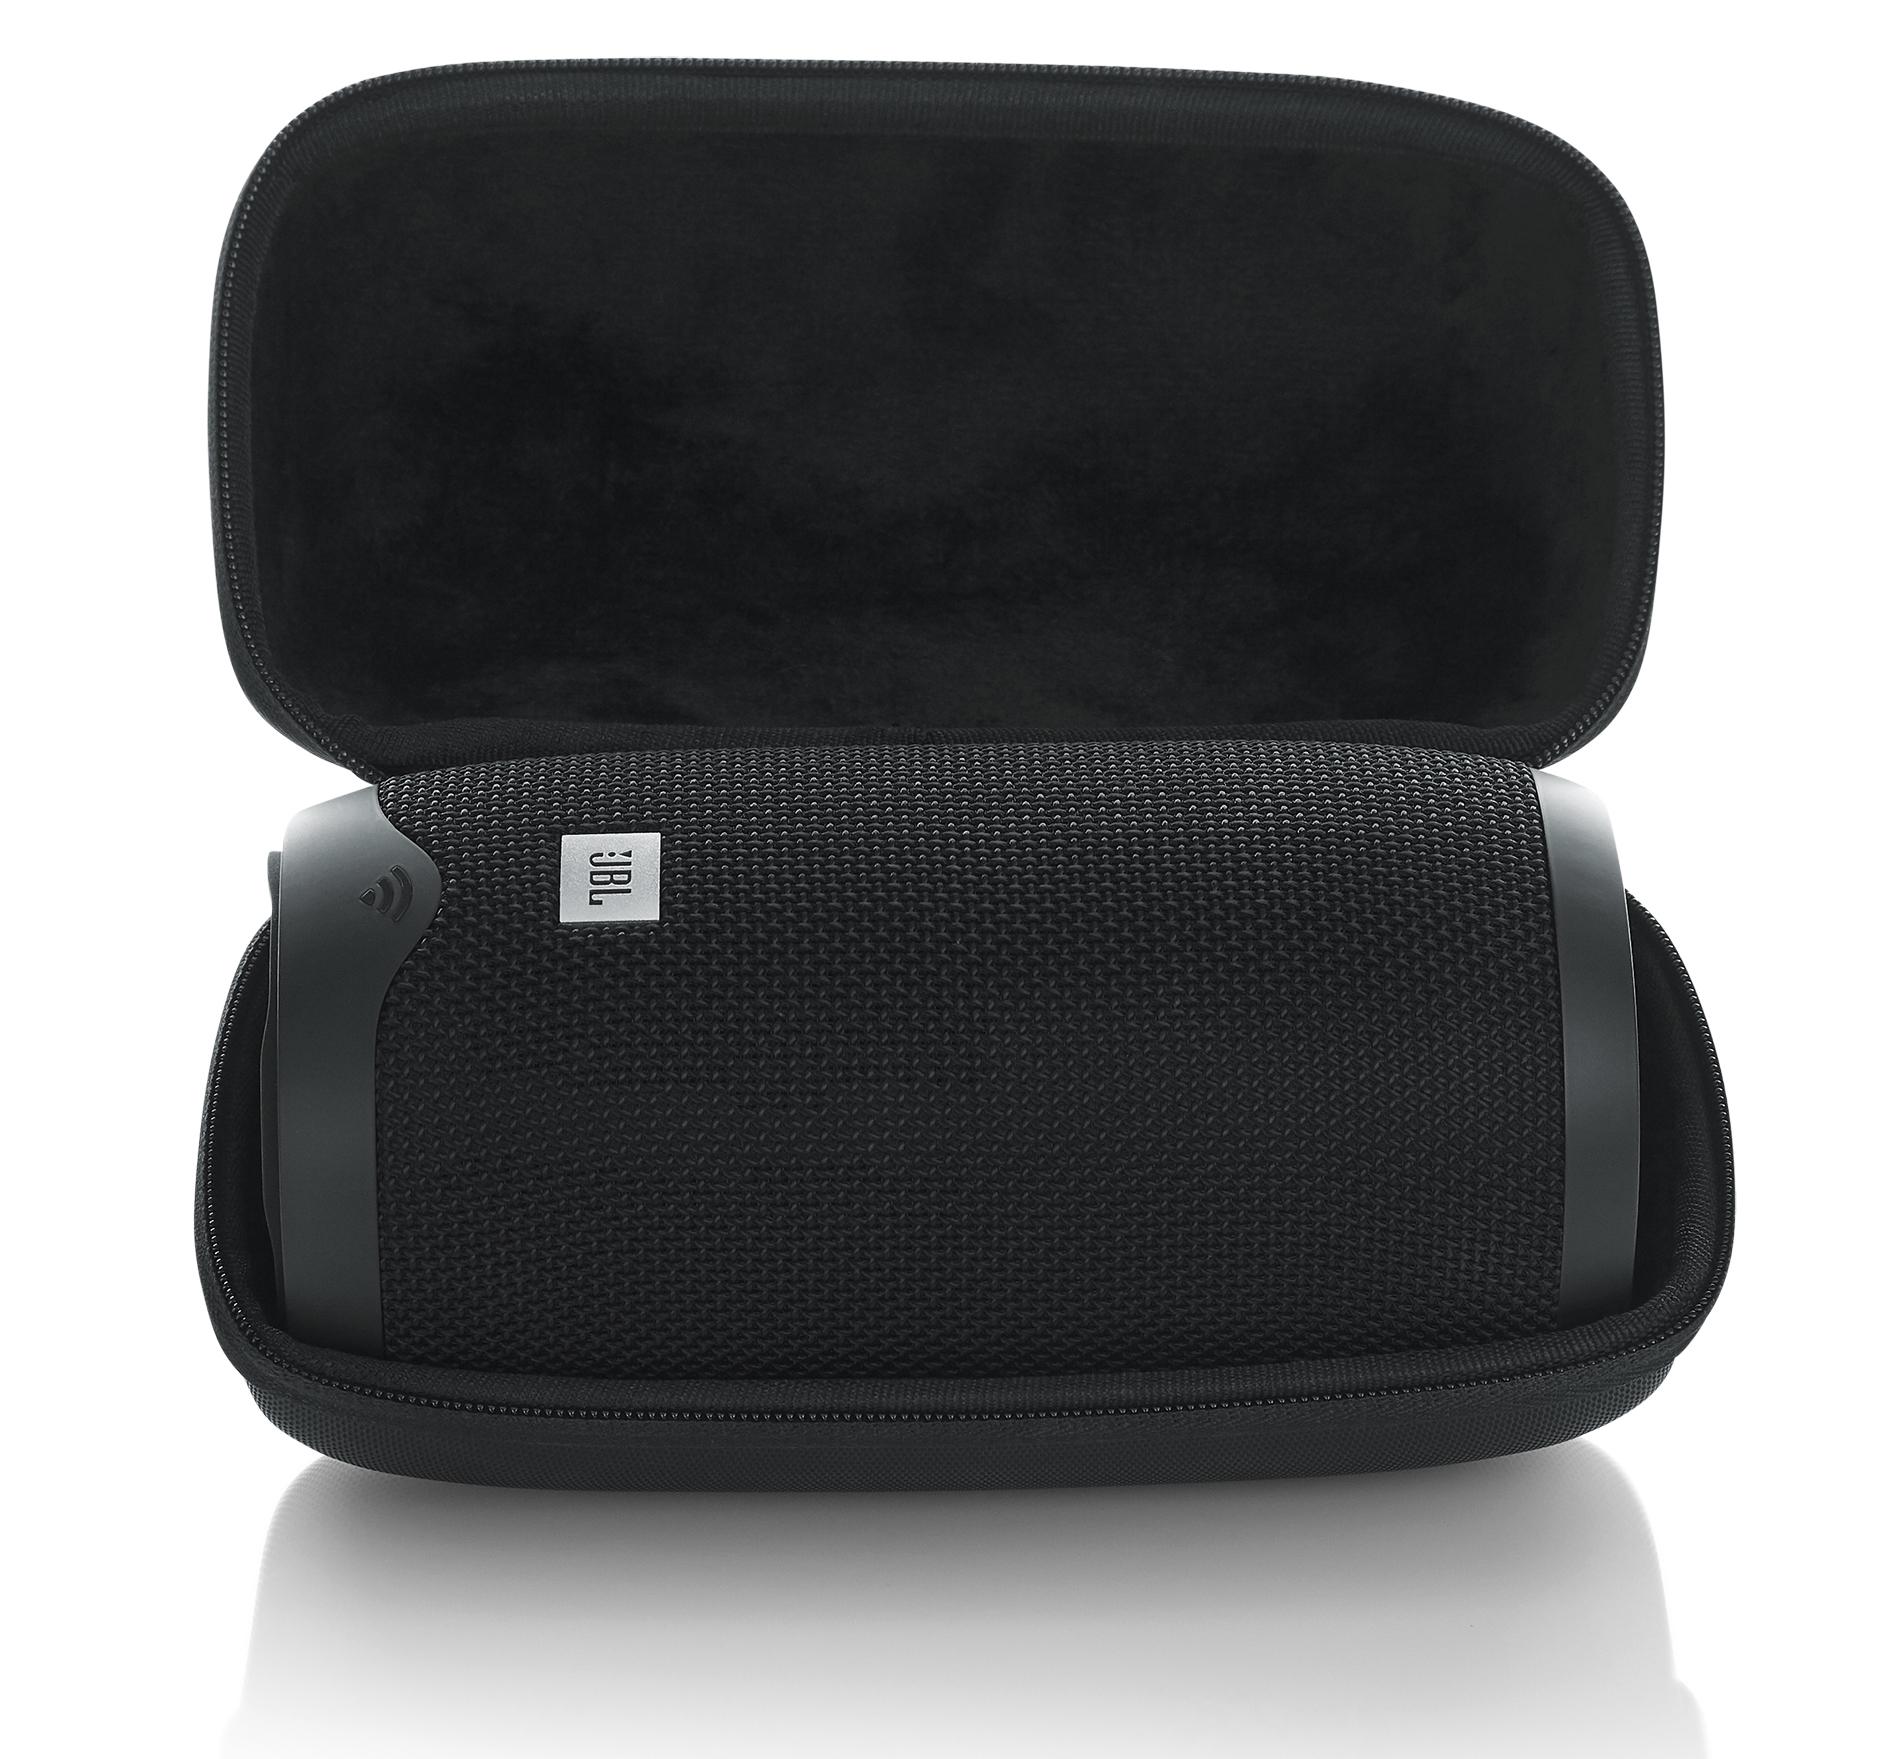 JBL Link 10 Case Open with Speaker